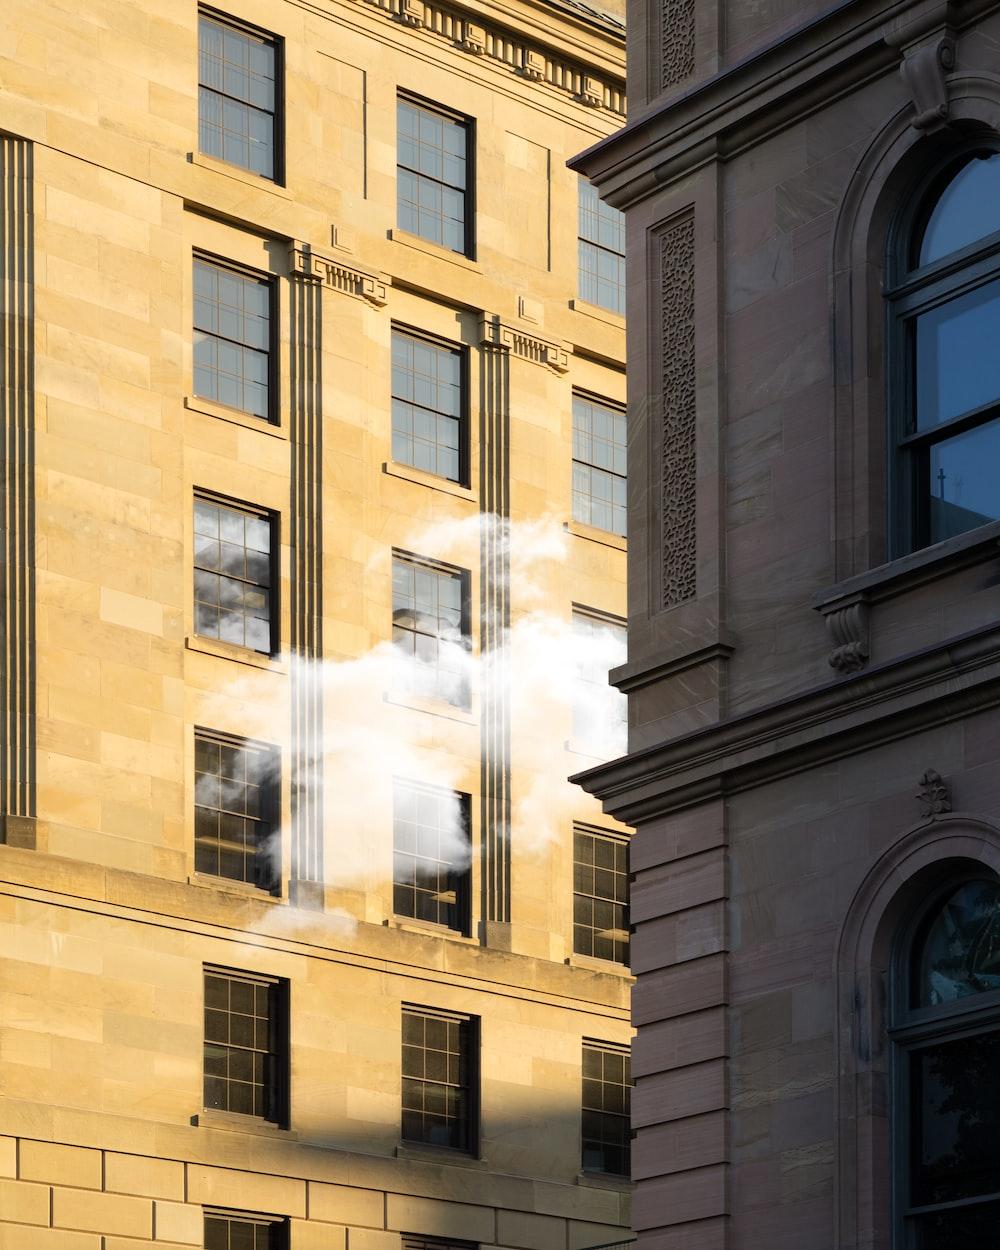 smoke coming from between buildings